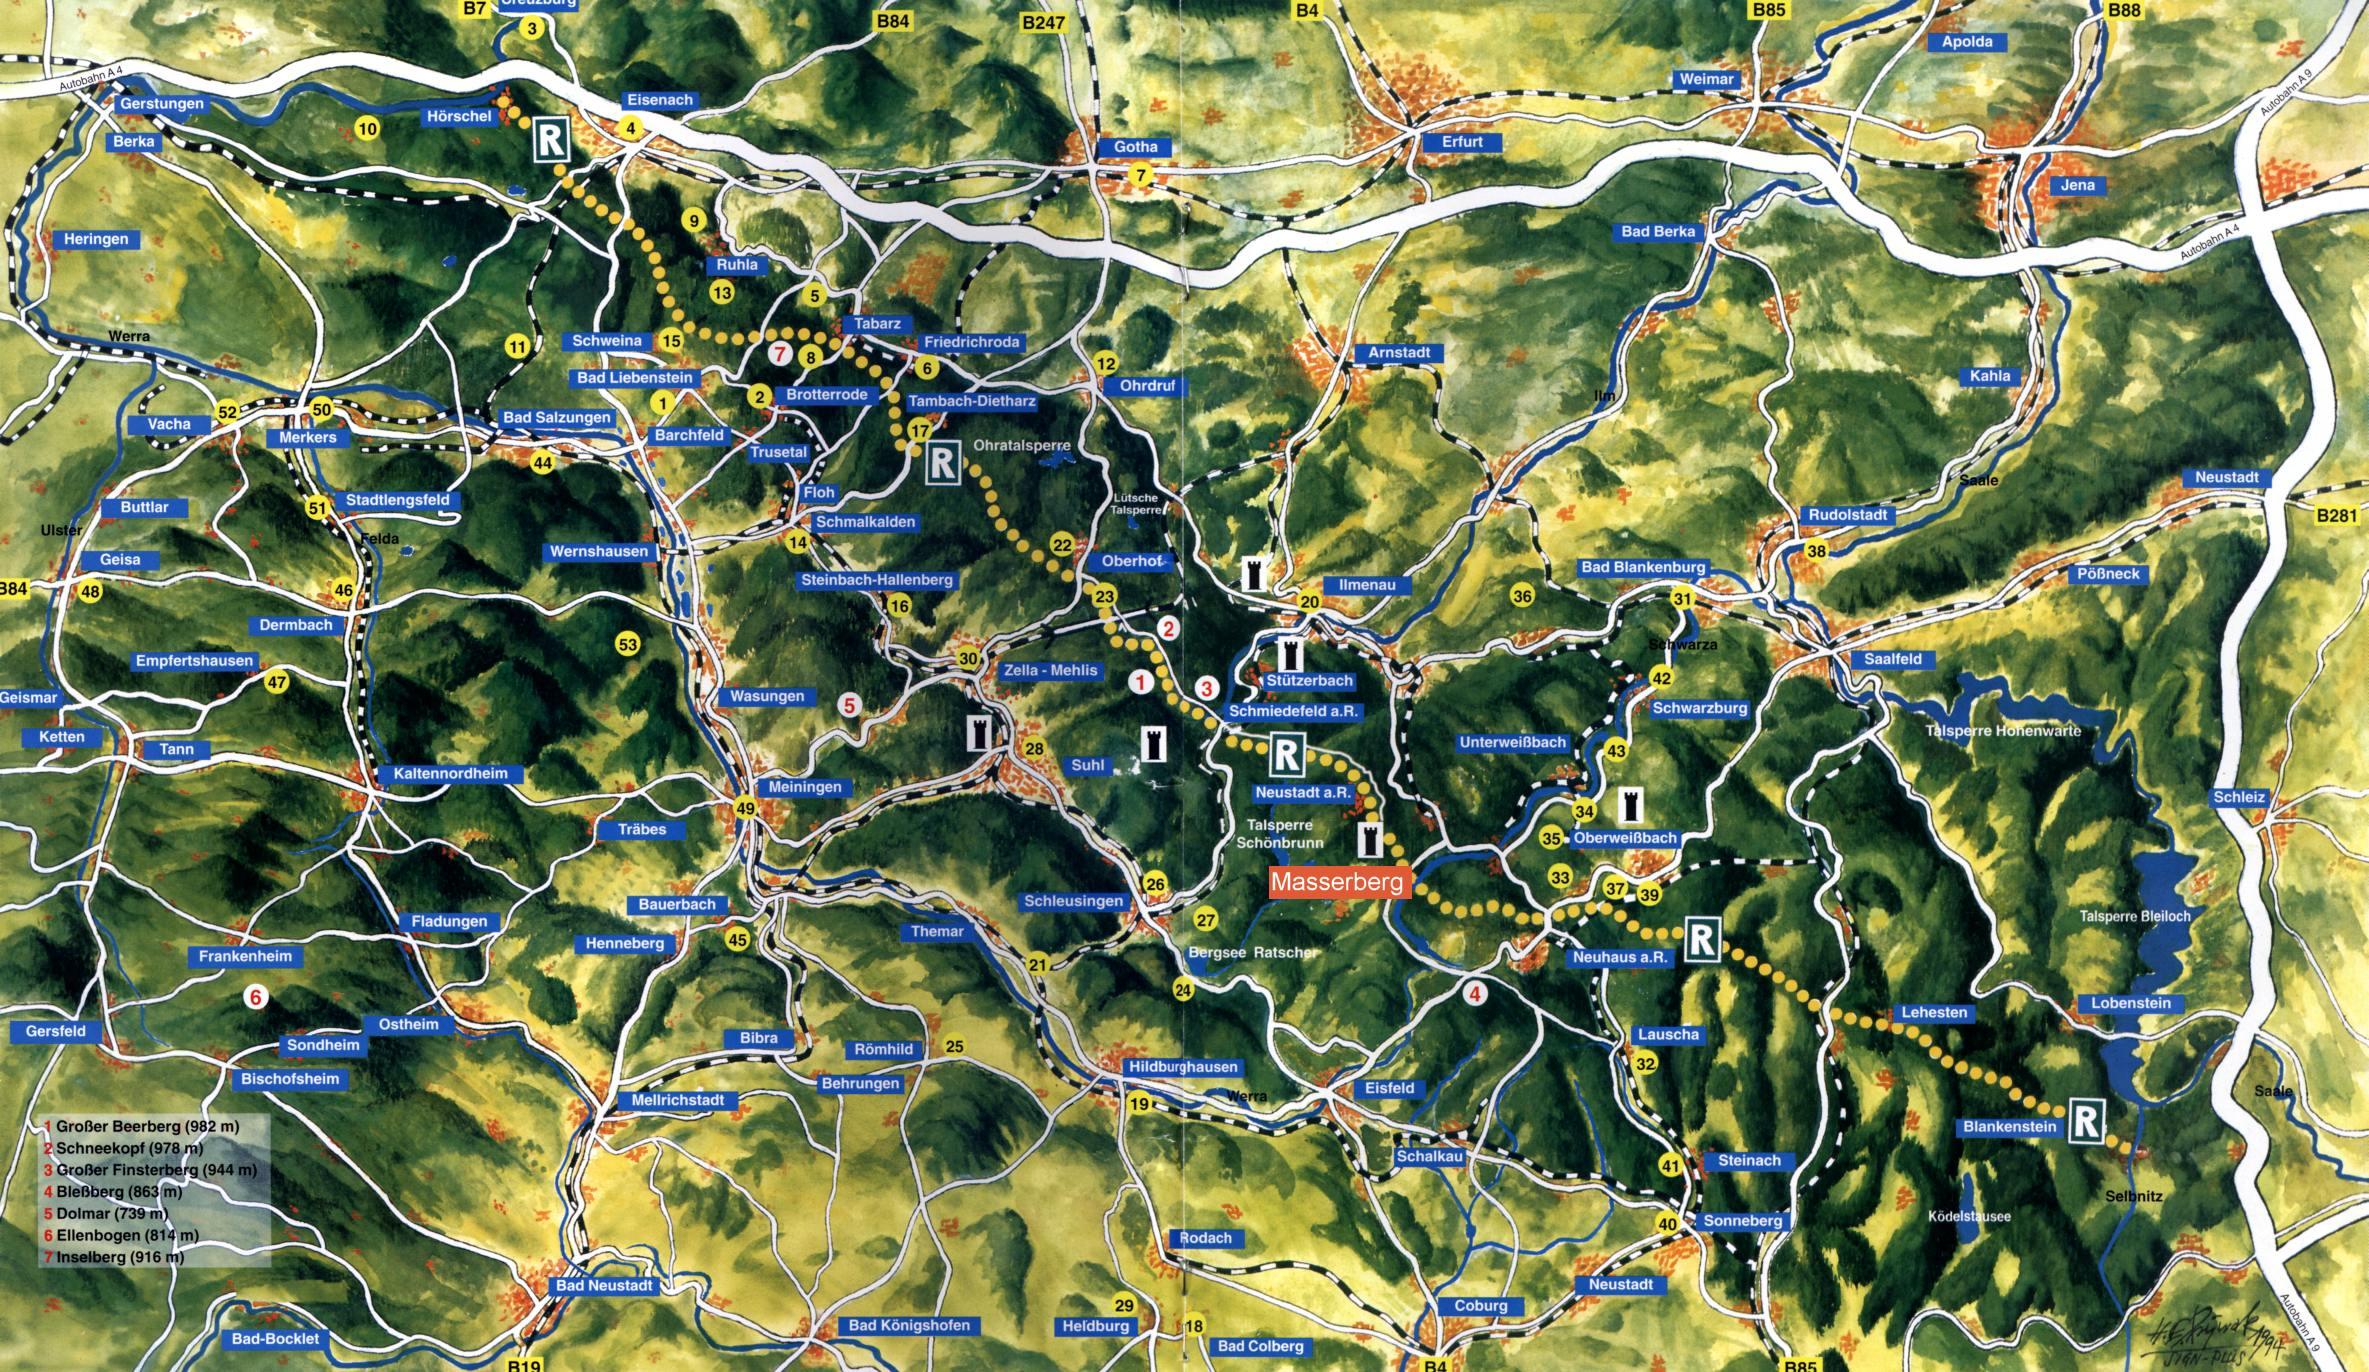 Thüringer Wald Karte.Ferienhaus Im Thüringer Wald